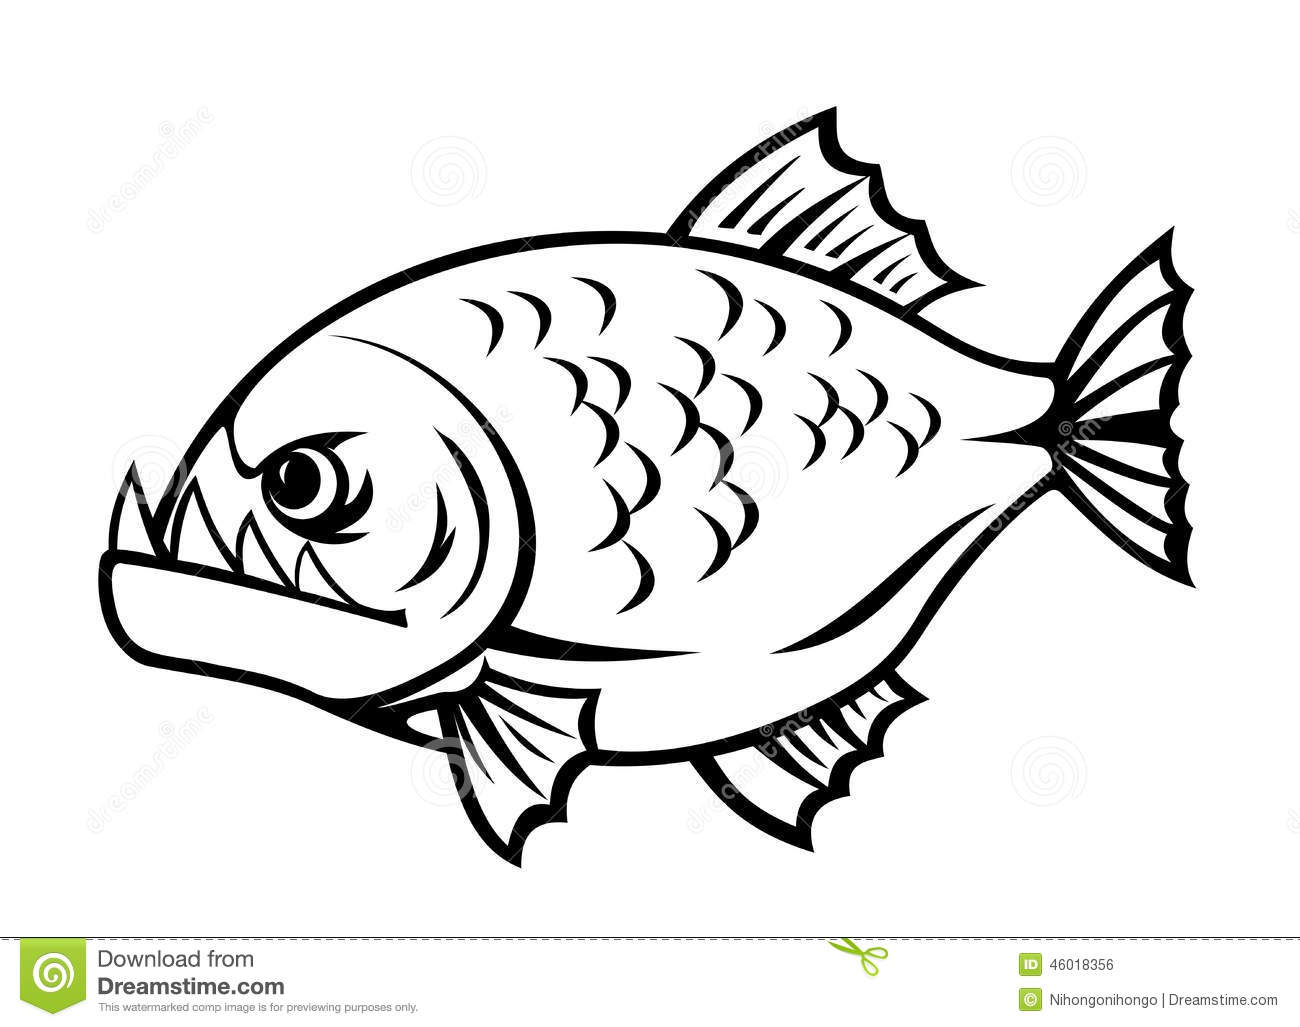 Piranha clipart #8, Download drawings